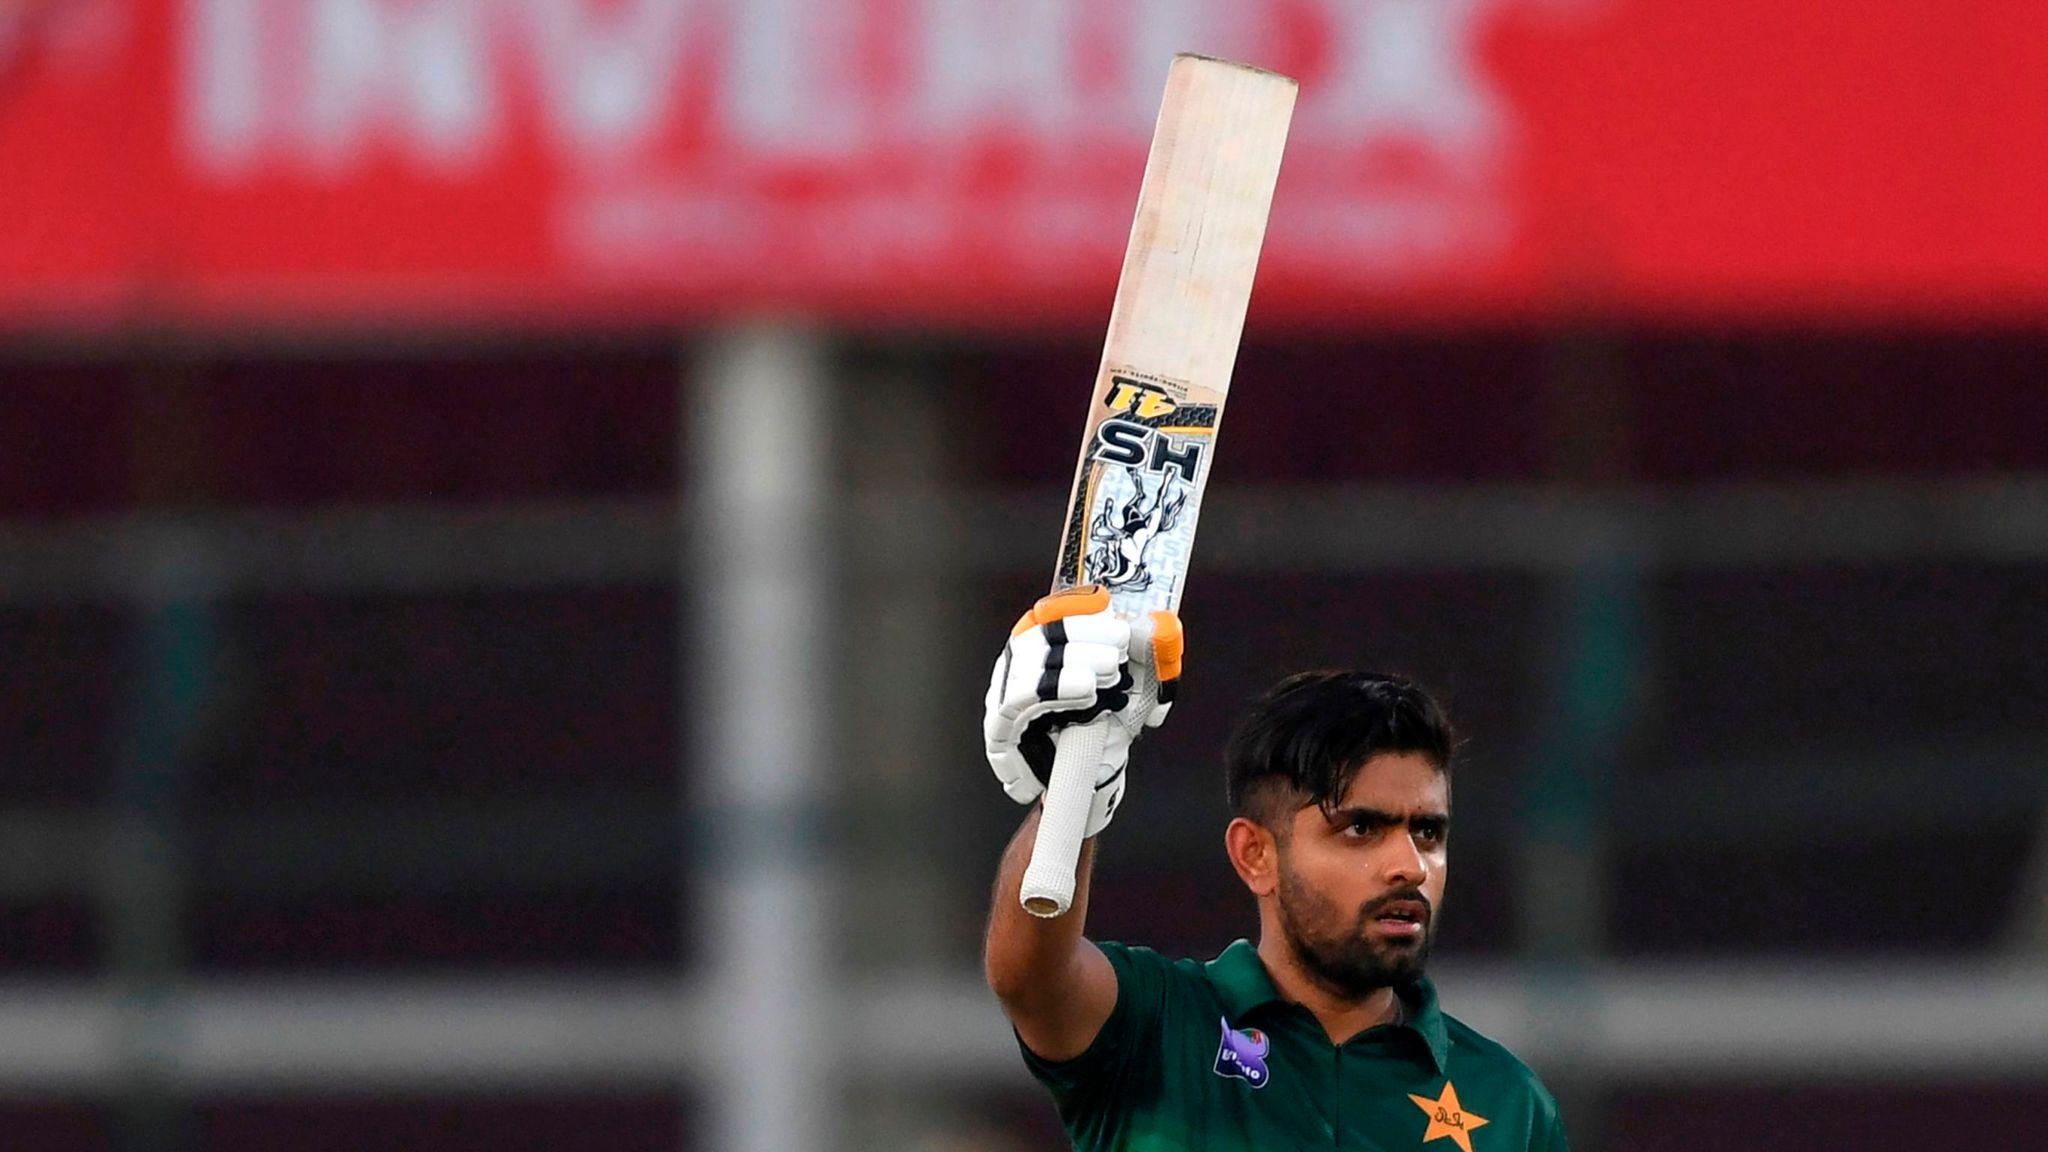 Azhar Ali replaces Sarfaraz Ahmed as Pakistan Test captain